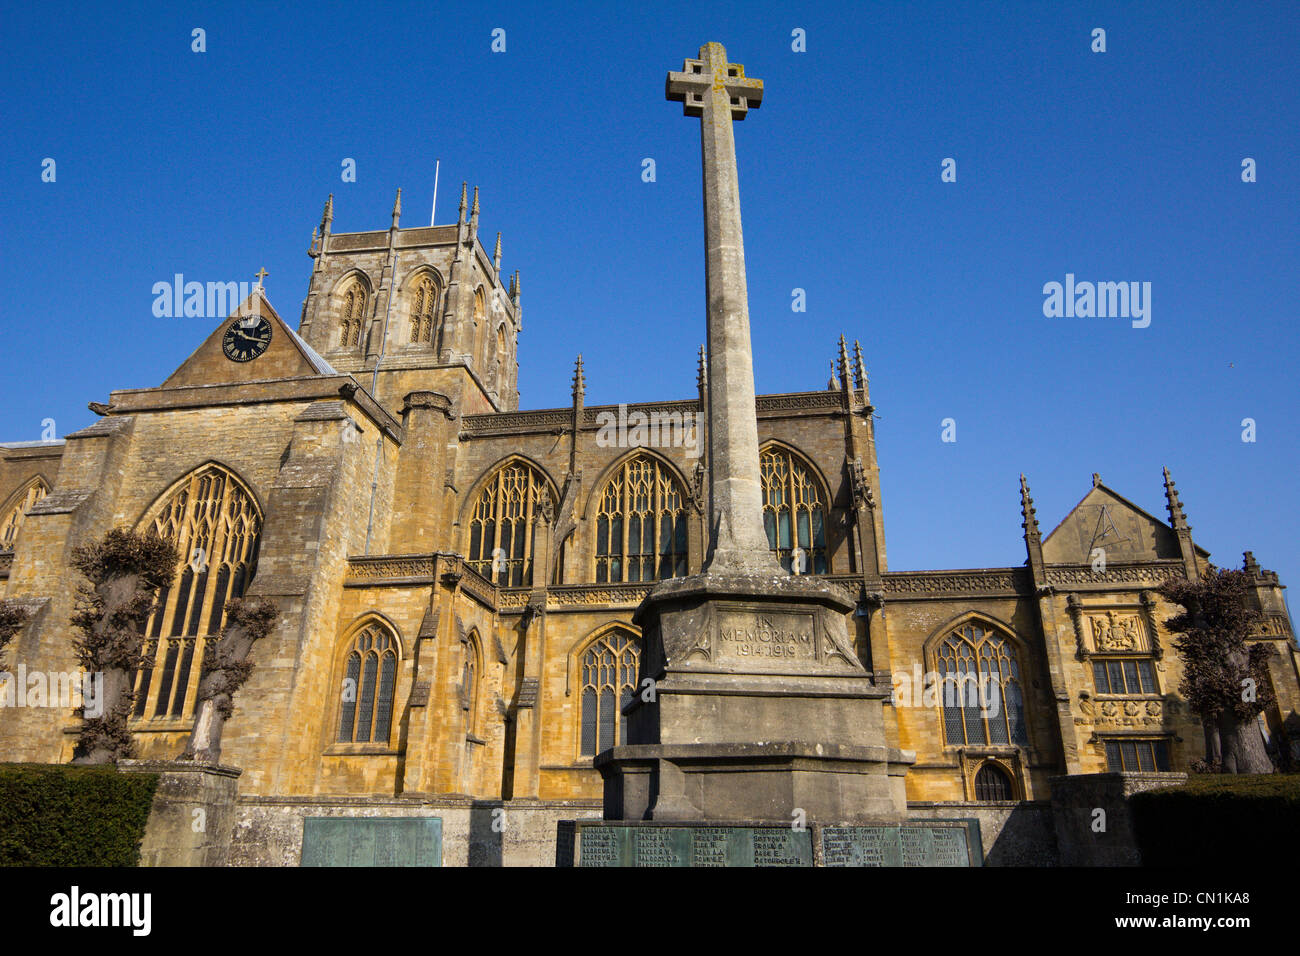 Sherborne abbey market town centre high street dorset england Stock Photo